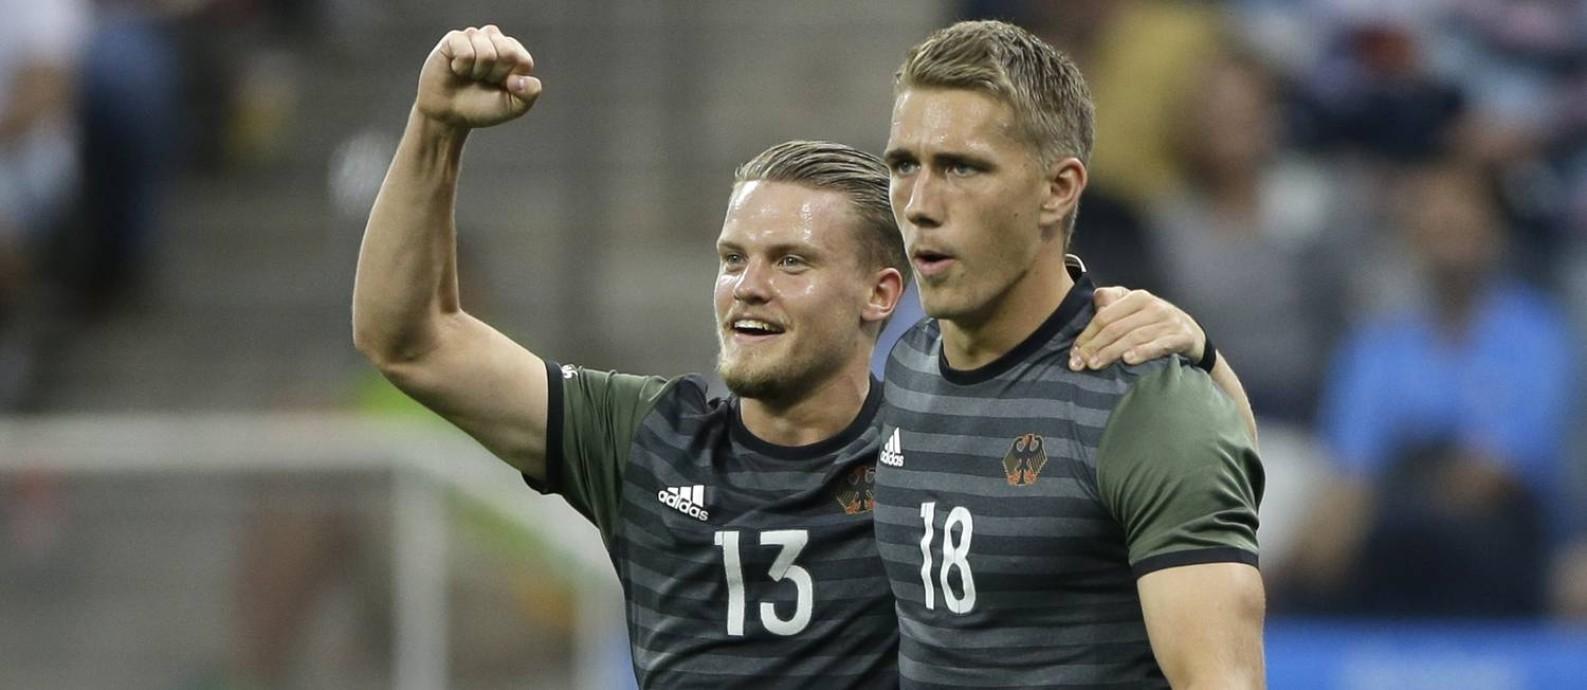 a9c7ab946d Petersen comemora com Philipp Max seu gol na vitória de 2 x 0 da Alemanha  sobre